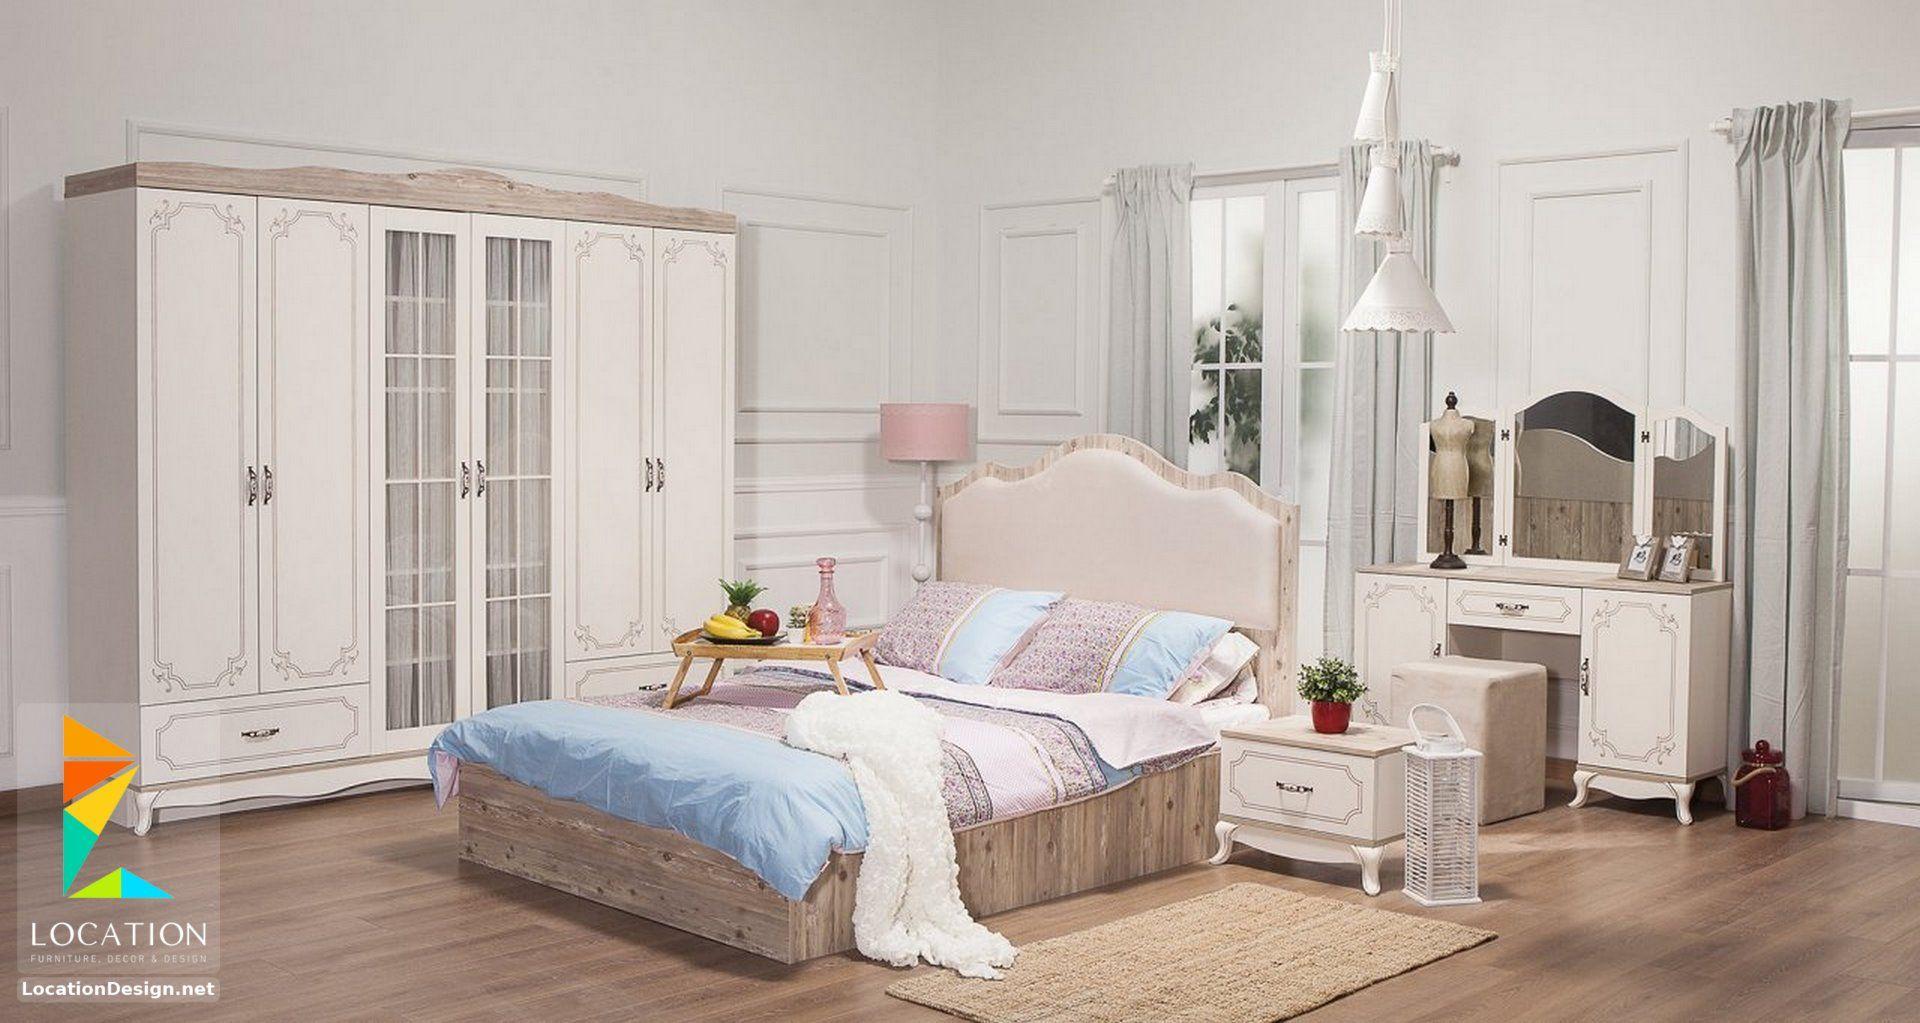 صور غرف نوم 2019 كامله احدث تصميمات غرف النوم للعرسان لوكشين ديزين نت Furniture Home Decor Home